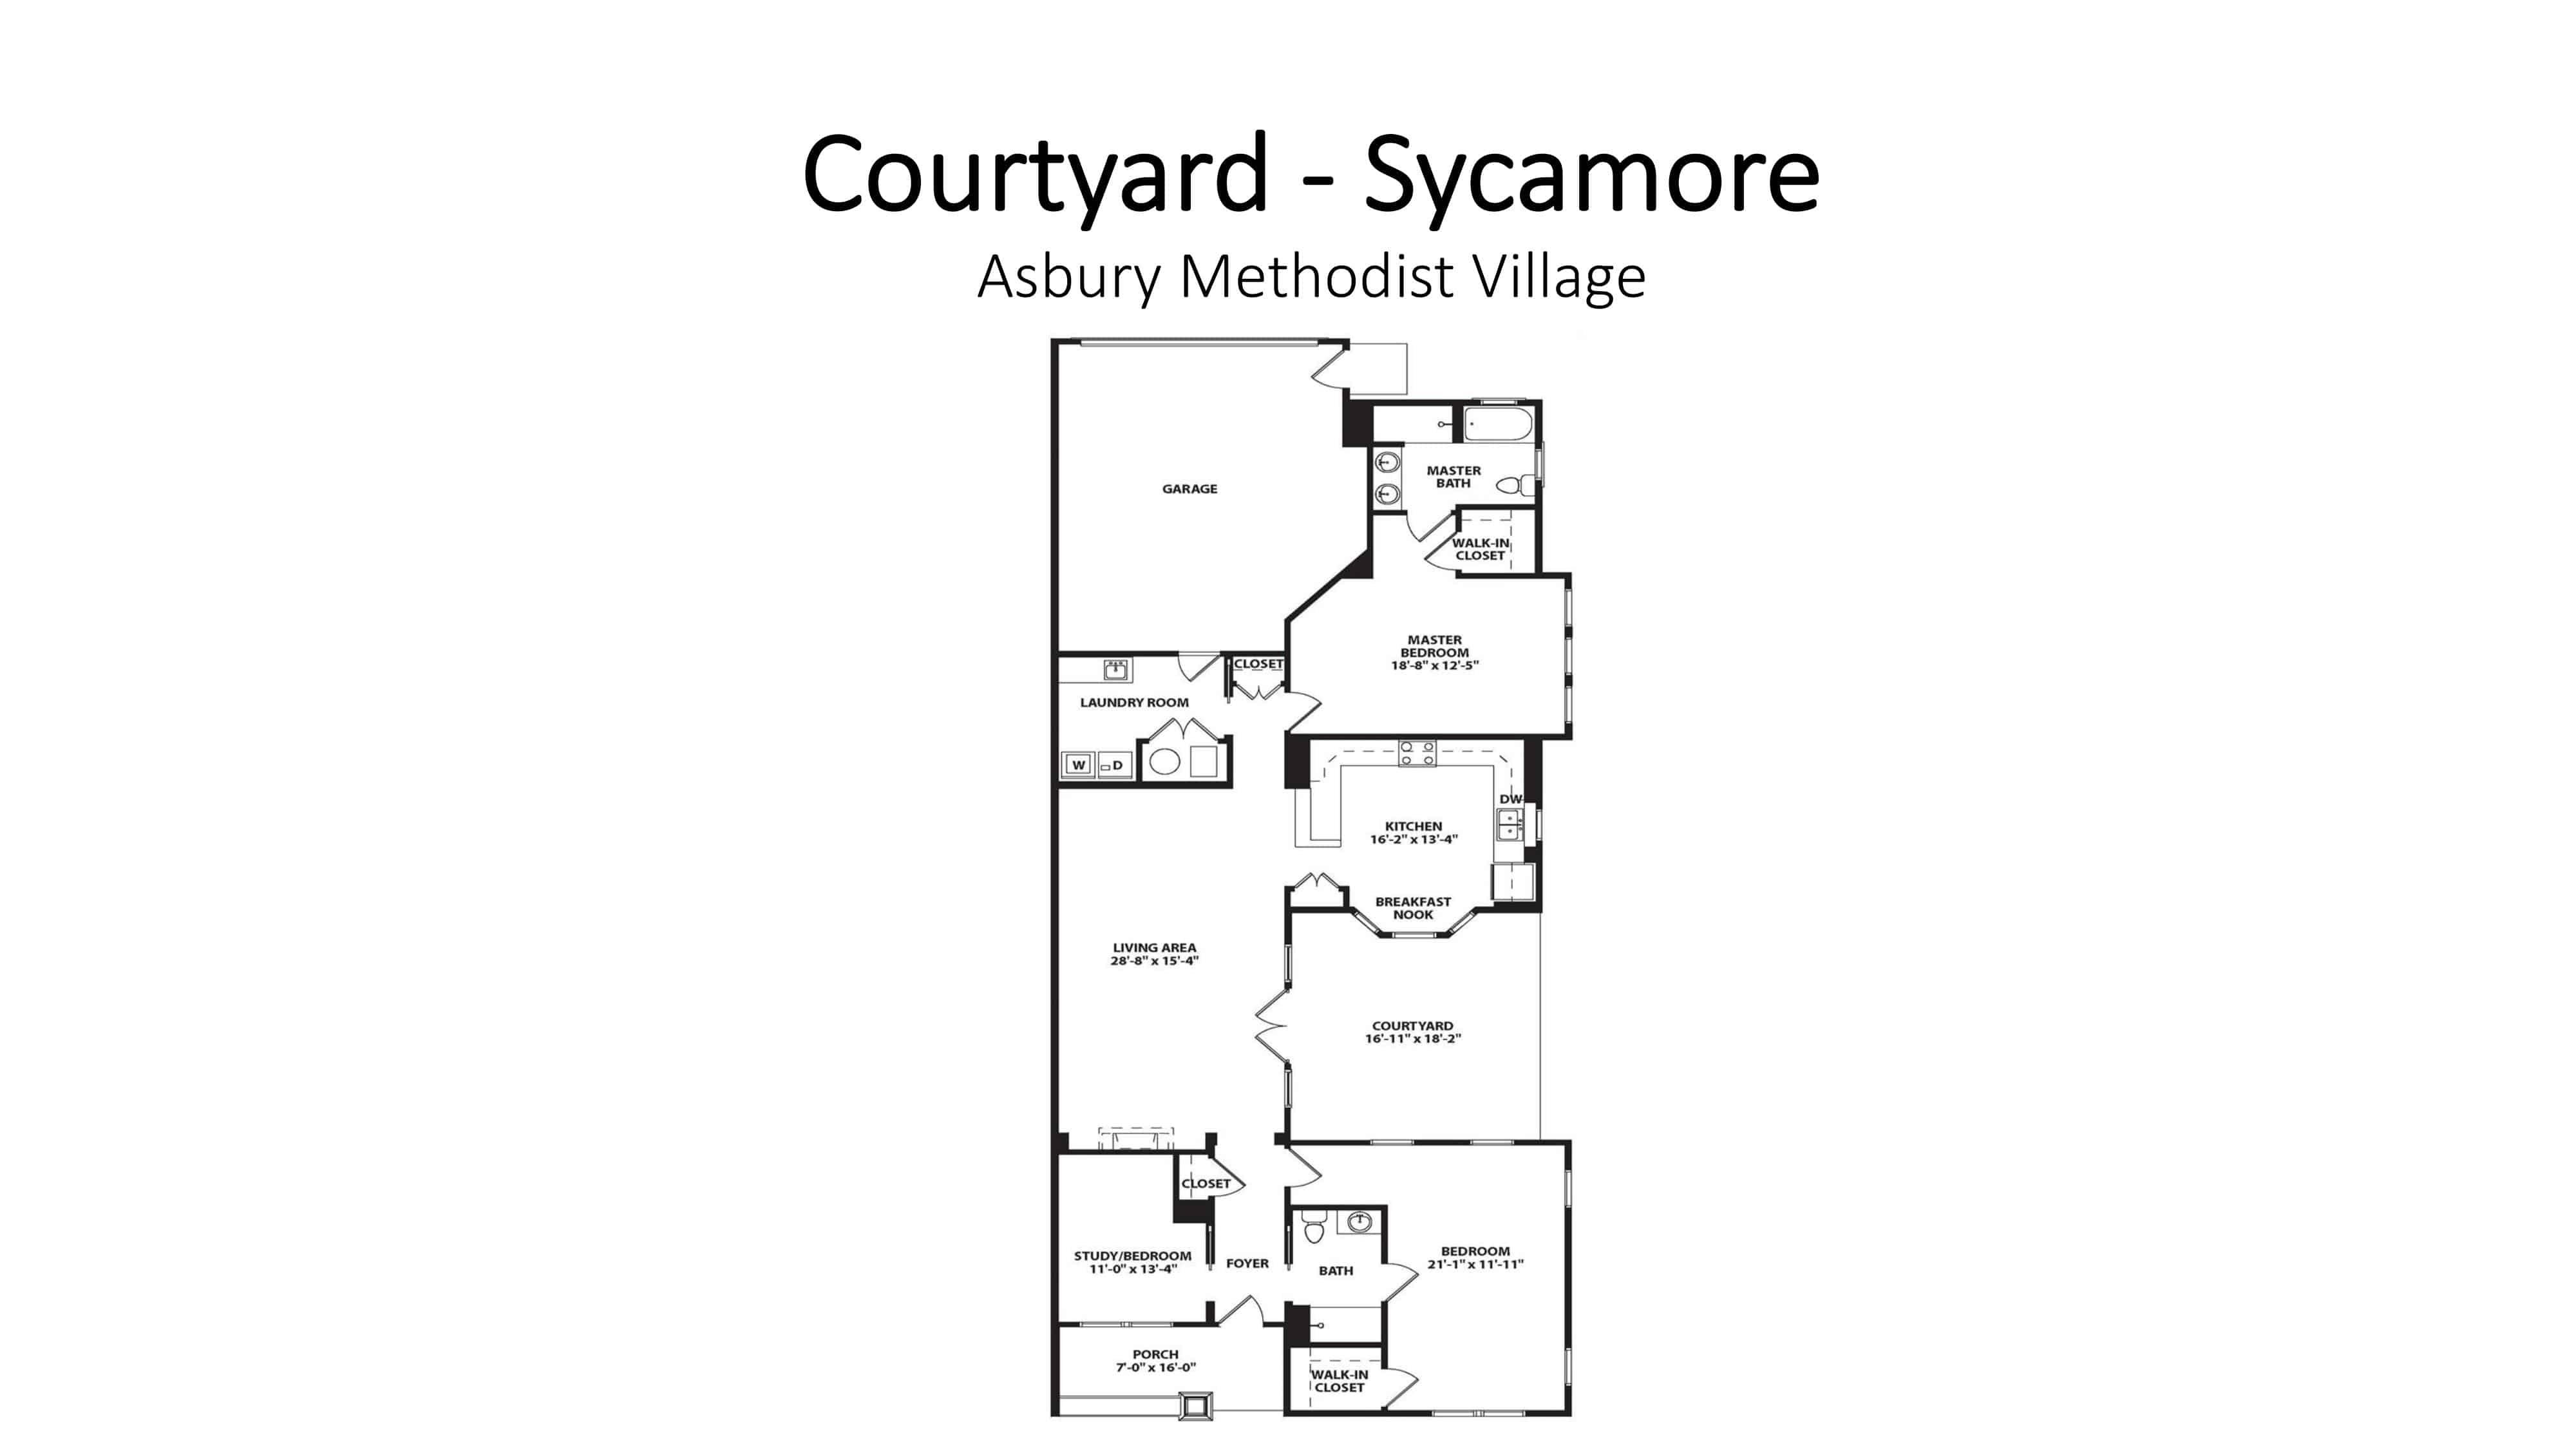 Asbury Methodist Village Courtyard - Sycamore